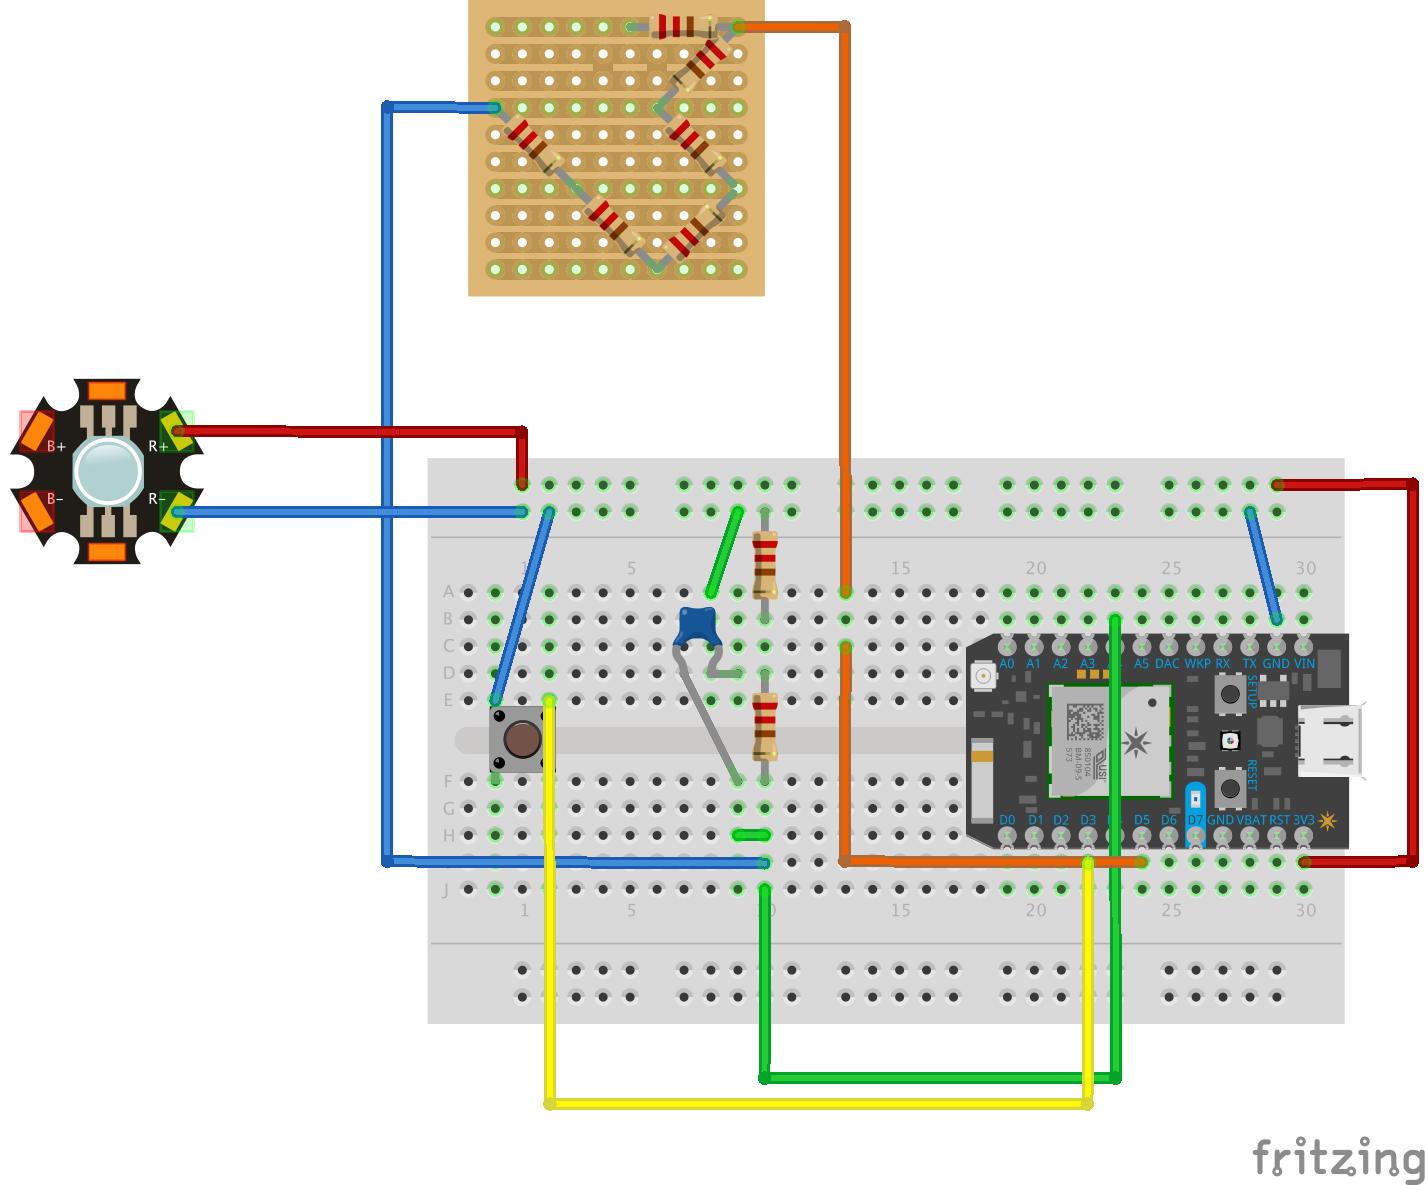 67oz circuit